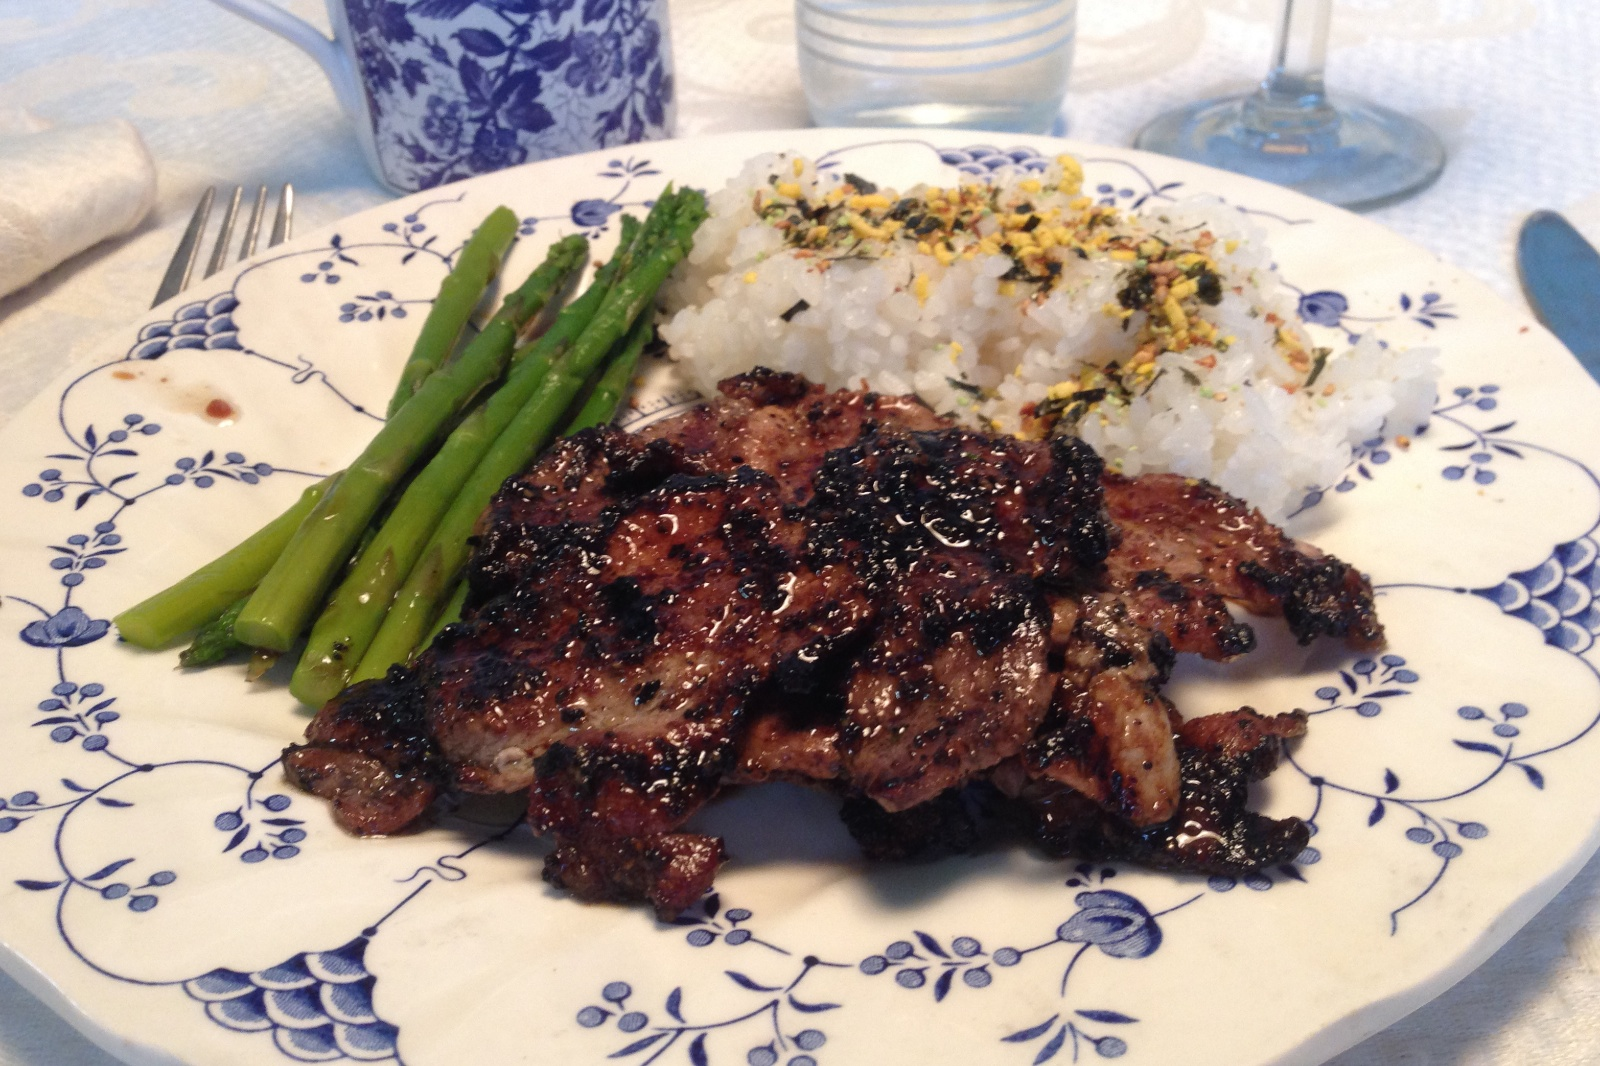 http://blog.rickk.com/food/2014/08/31/ate.2014.08.31.d.jpg